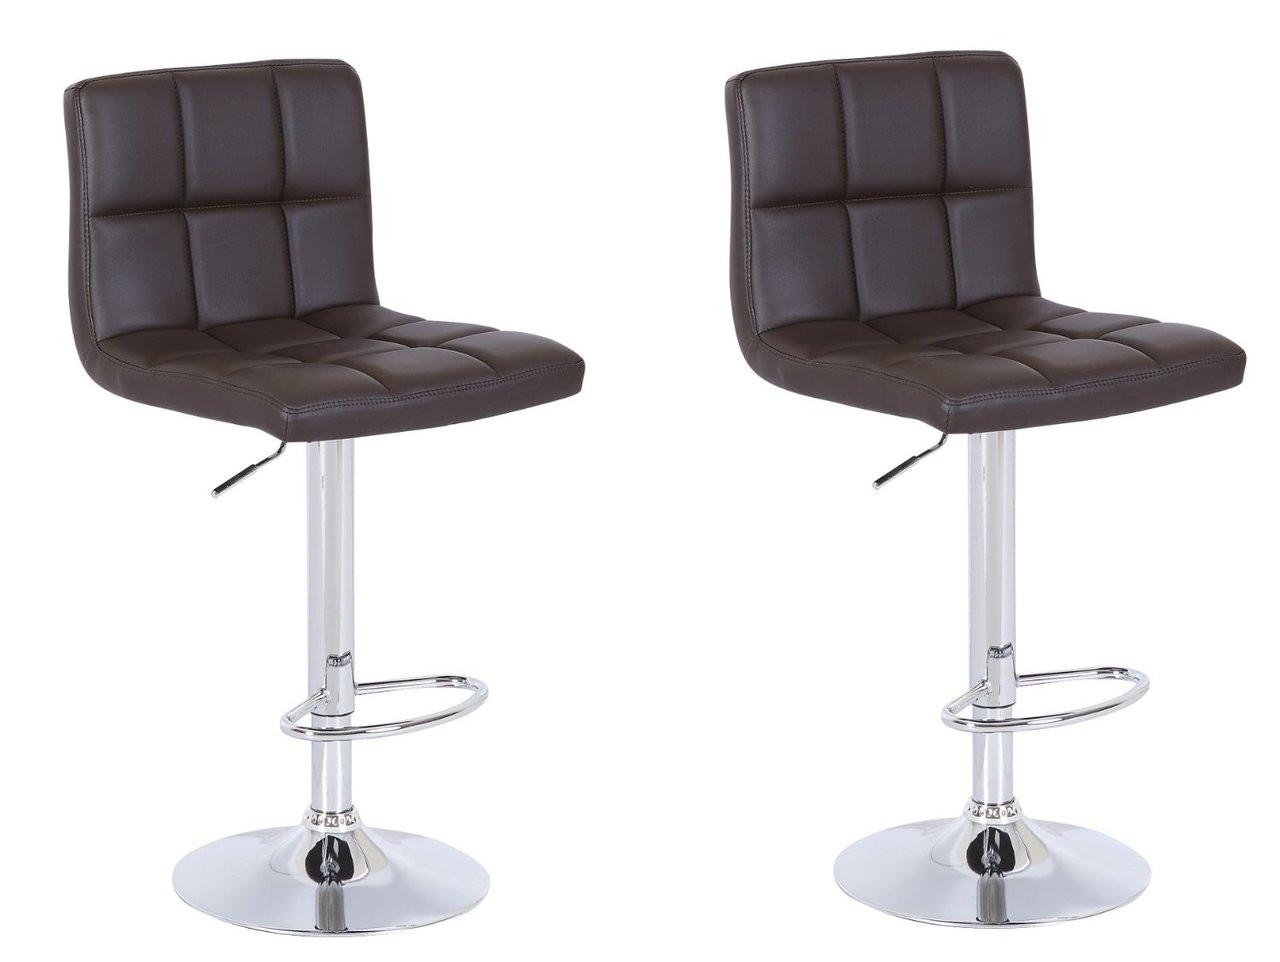 Pleasant Chocolate High Back Leatherette Adjustable Hydraulic Bar Stool Set Of 2 Brown Machost Co Dining Chair Design Ideas Machostcouk